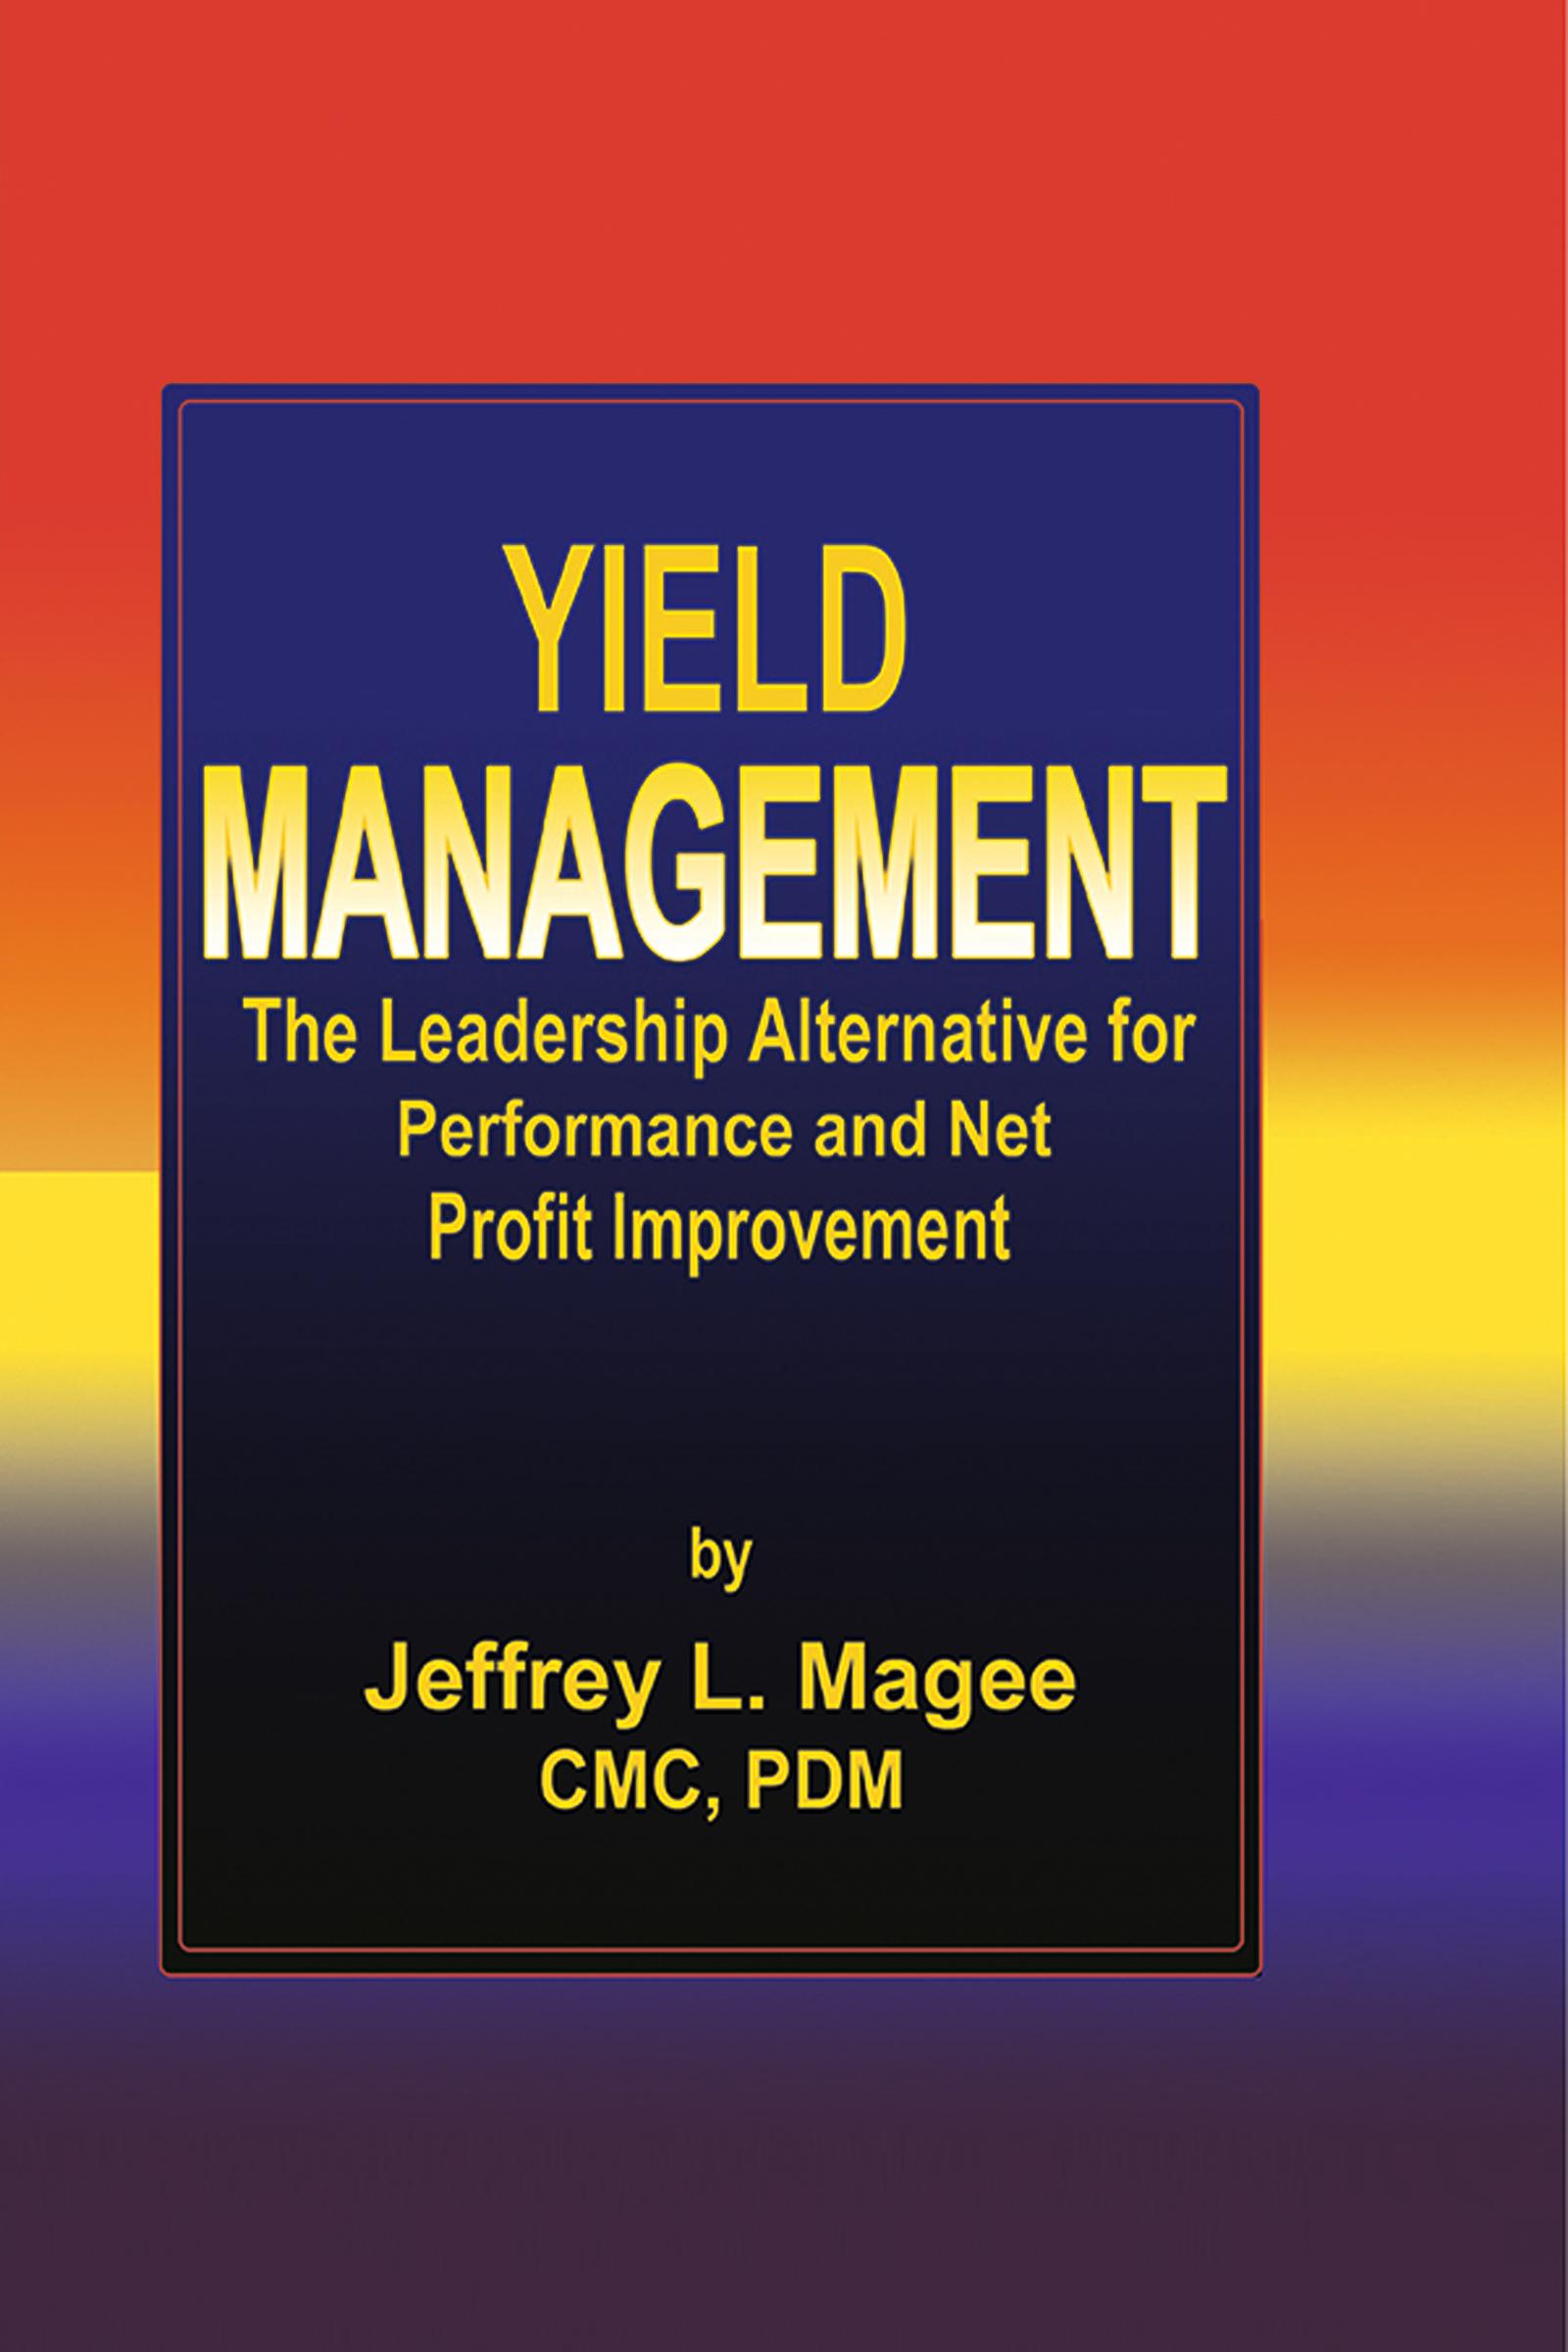 Yield ManagementThe Leadership Alternative for Performance and Net Profit Improvement